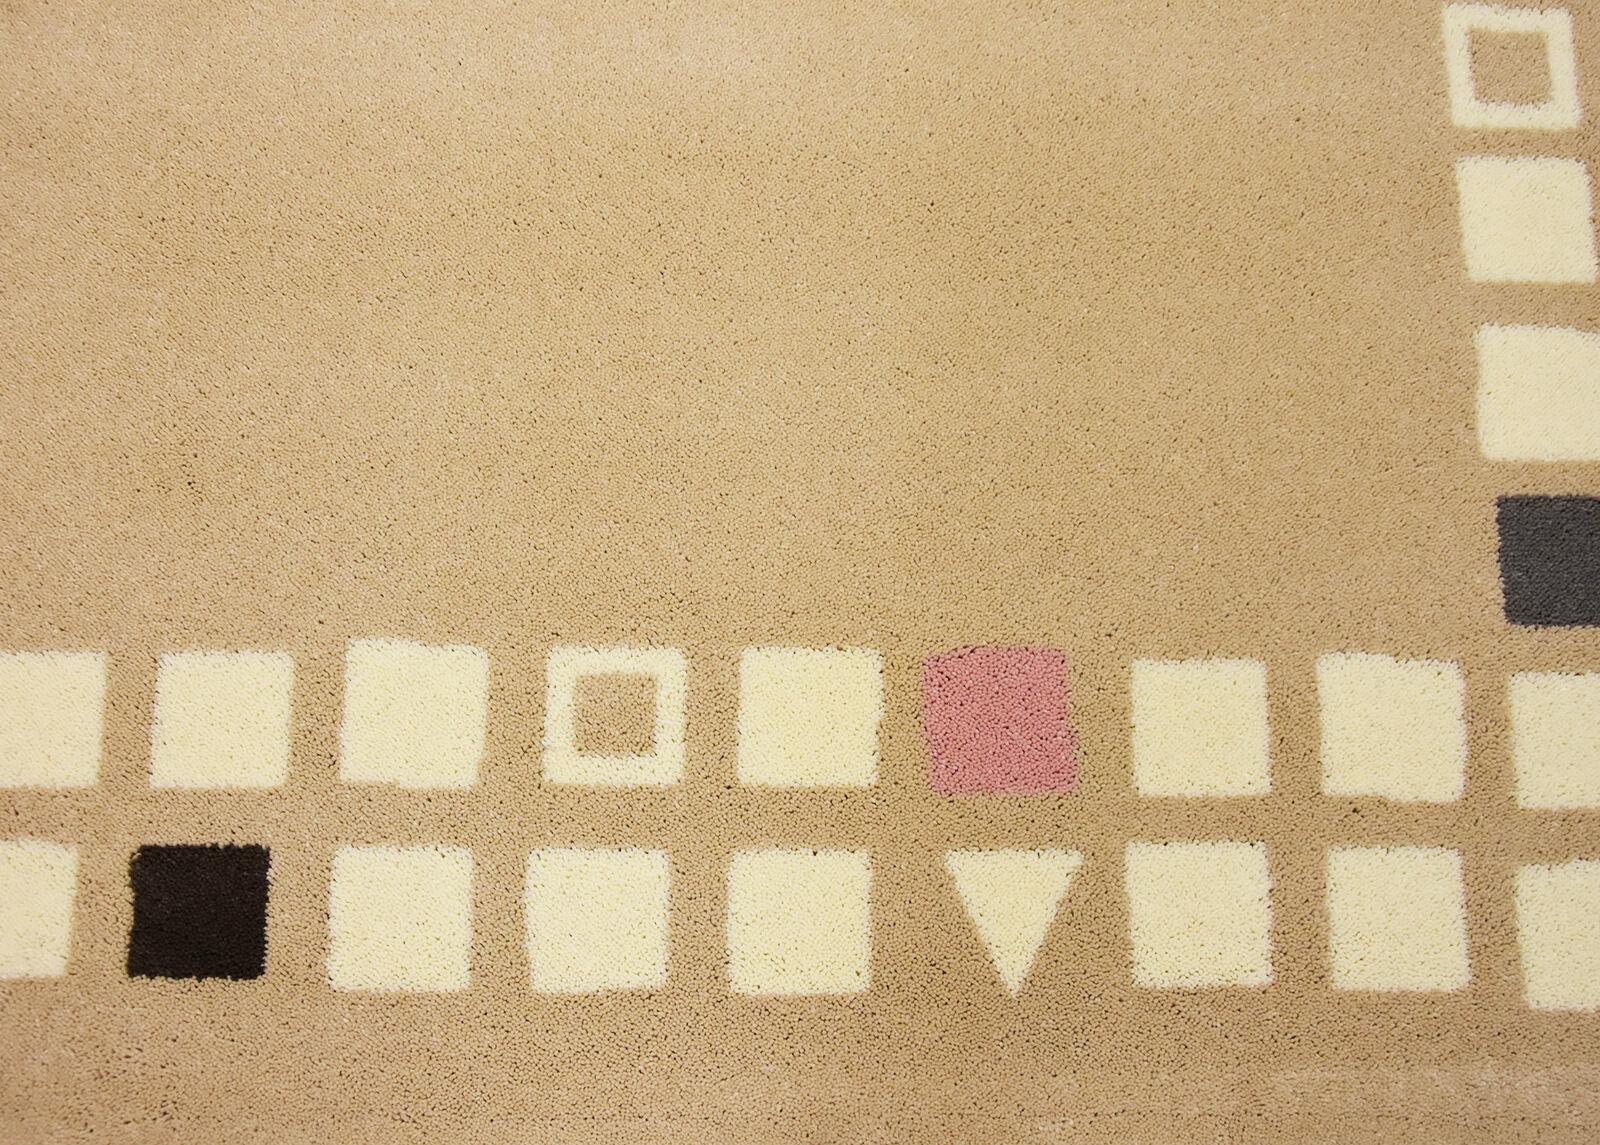 Moldabela Matto 160x230 cm